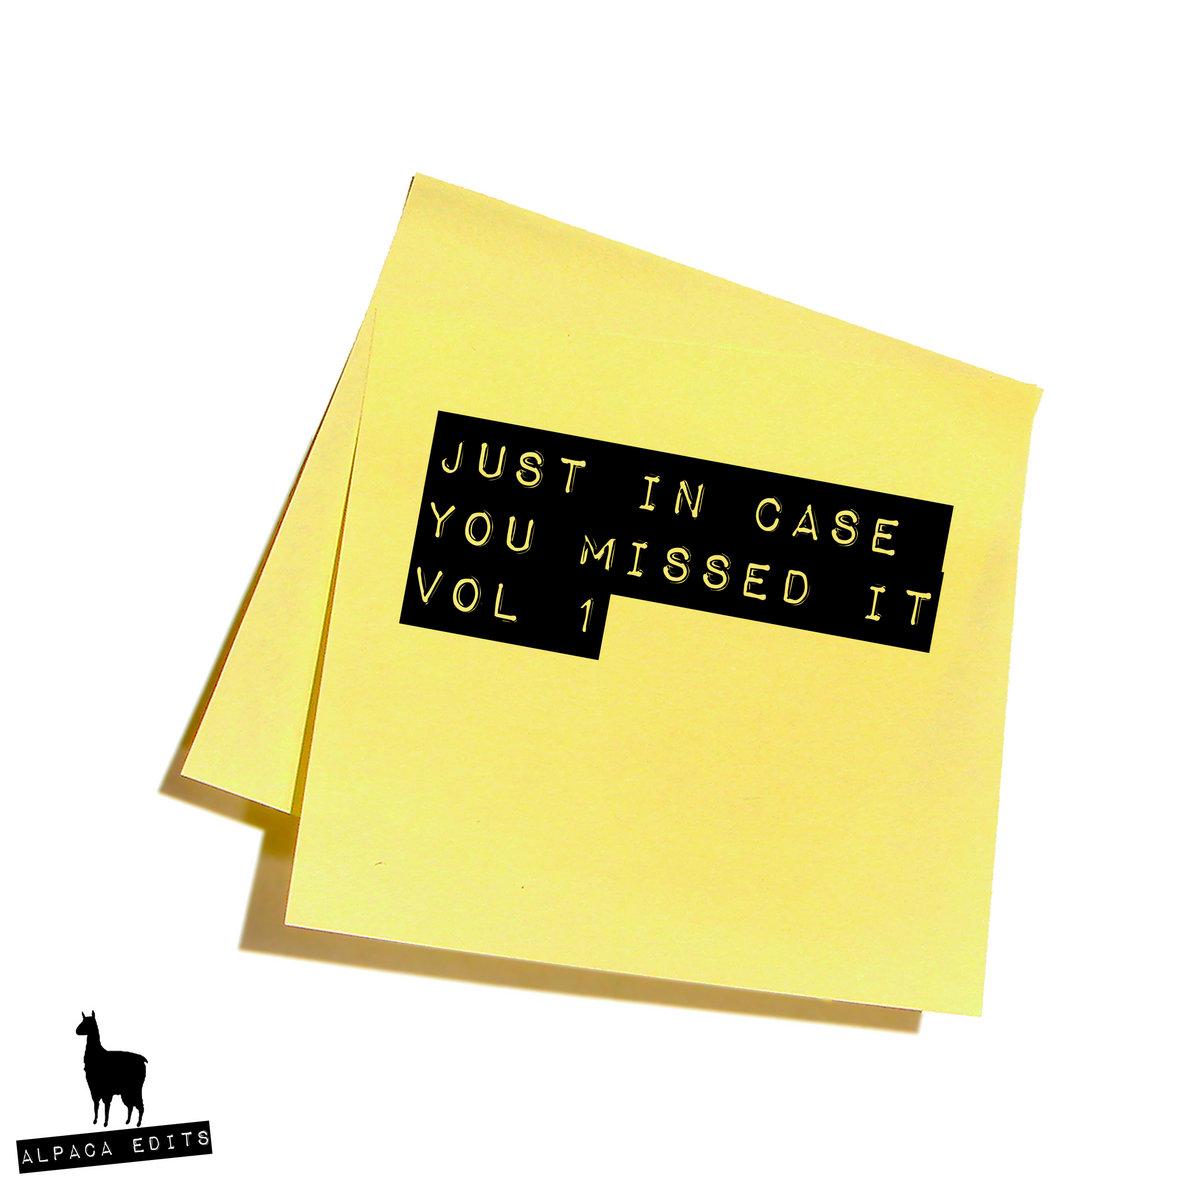 ef10841f04 Just in Case You Missed It Vol 1 | Alpaca Edits